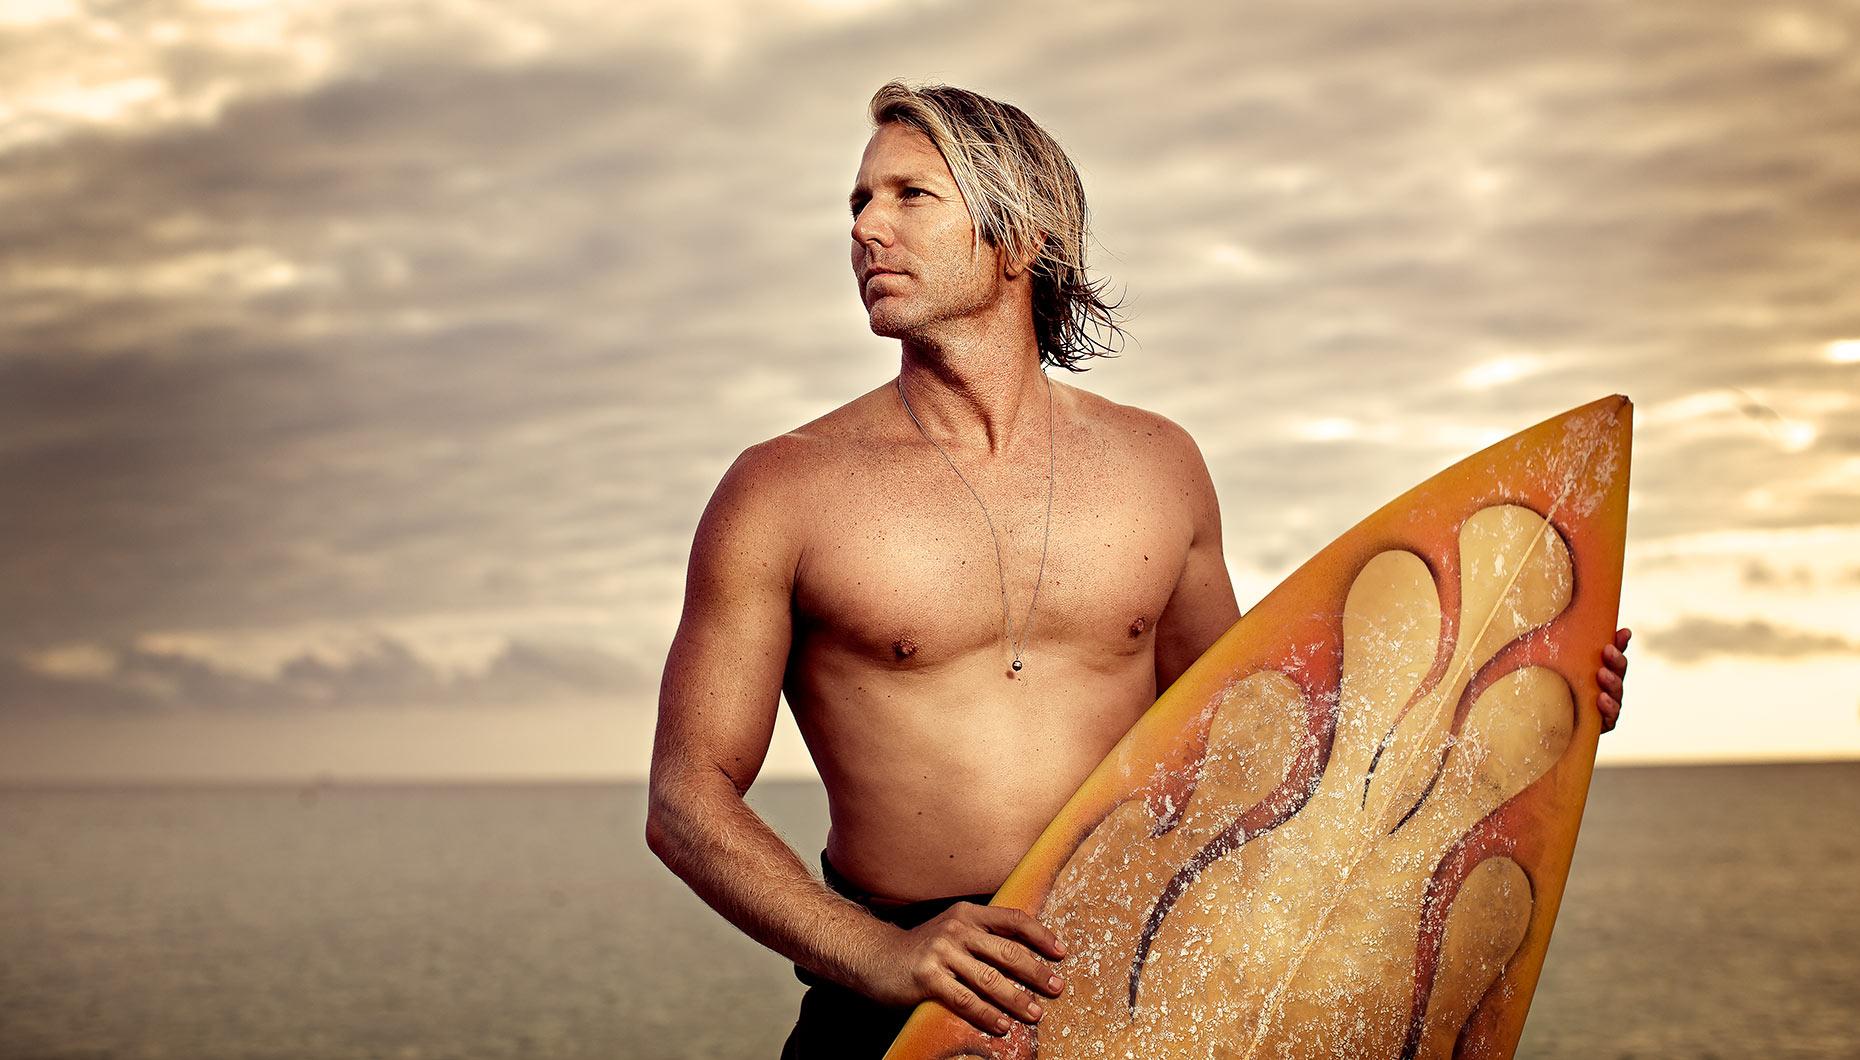 SURFER.PORTRAIT.jpg